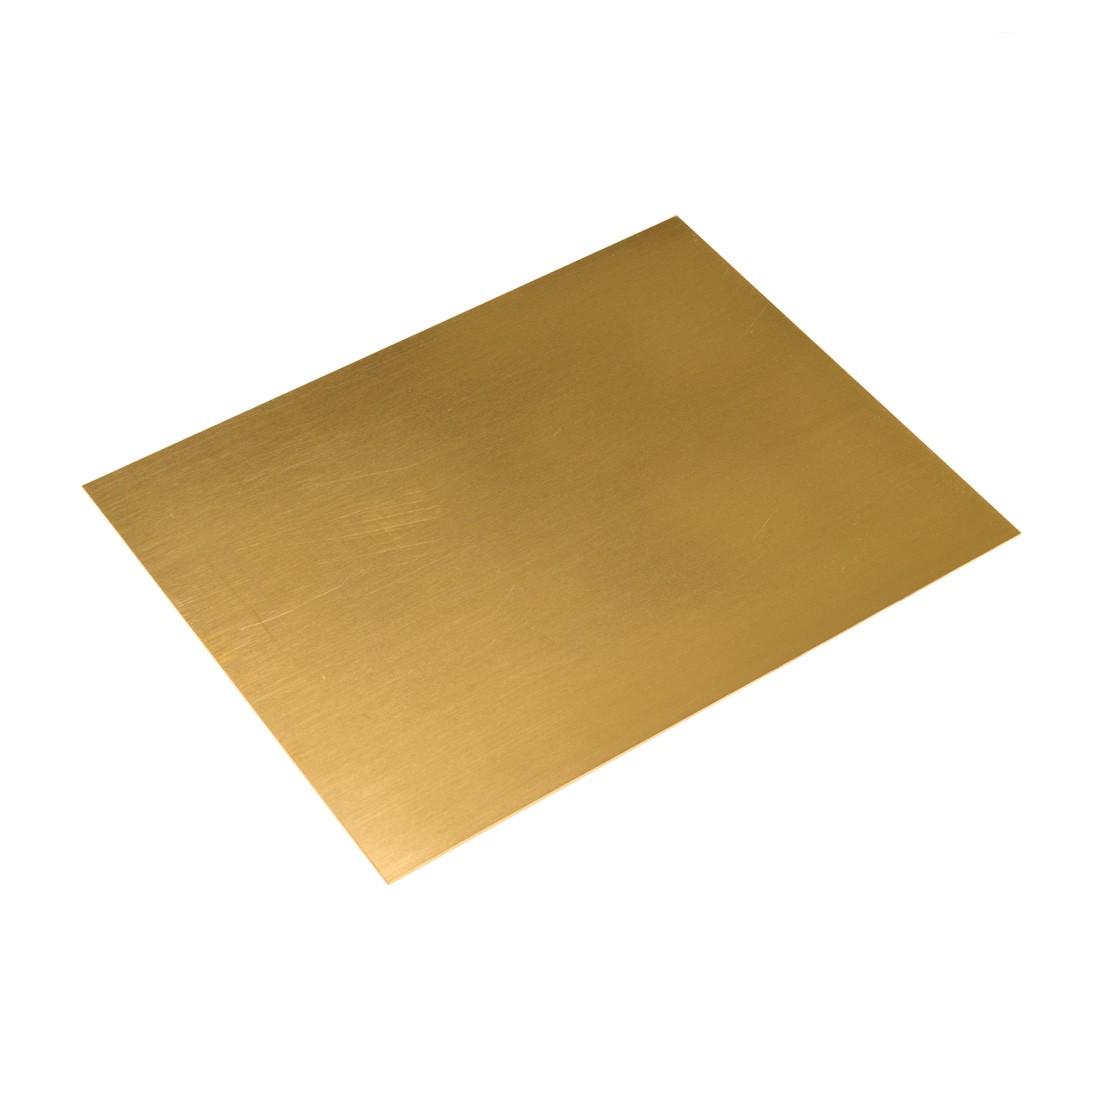 Lastra Ottone Crudo mm.220x170 spess. 0,5